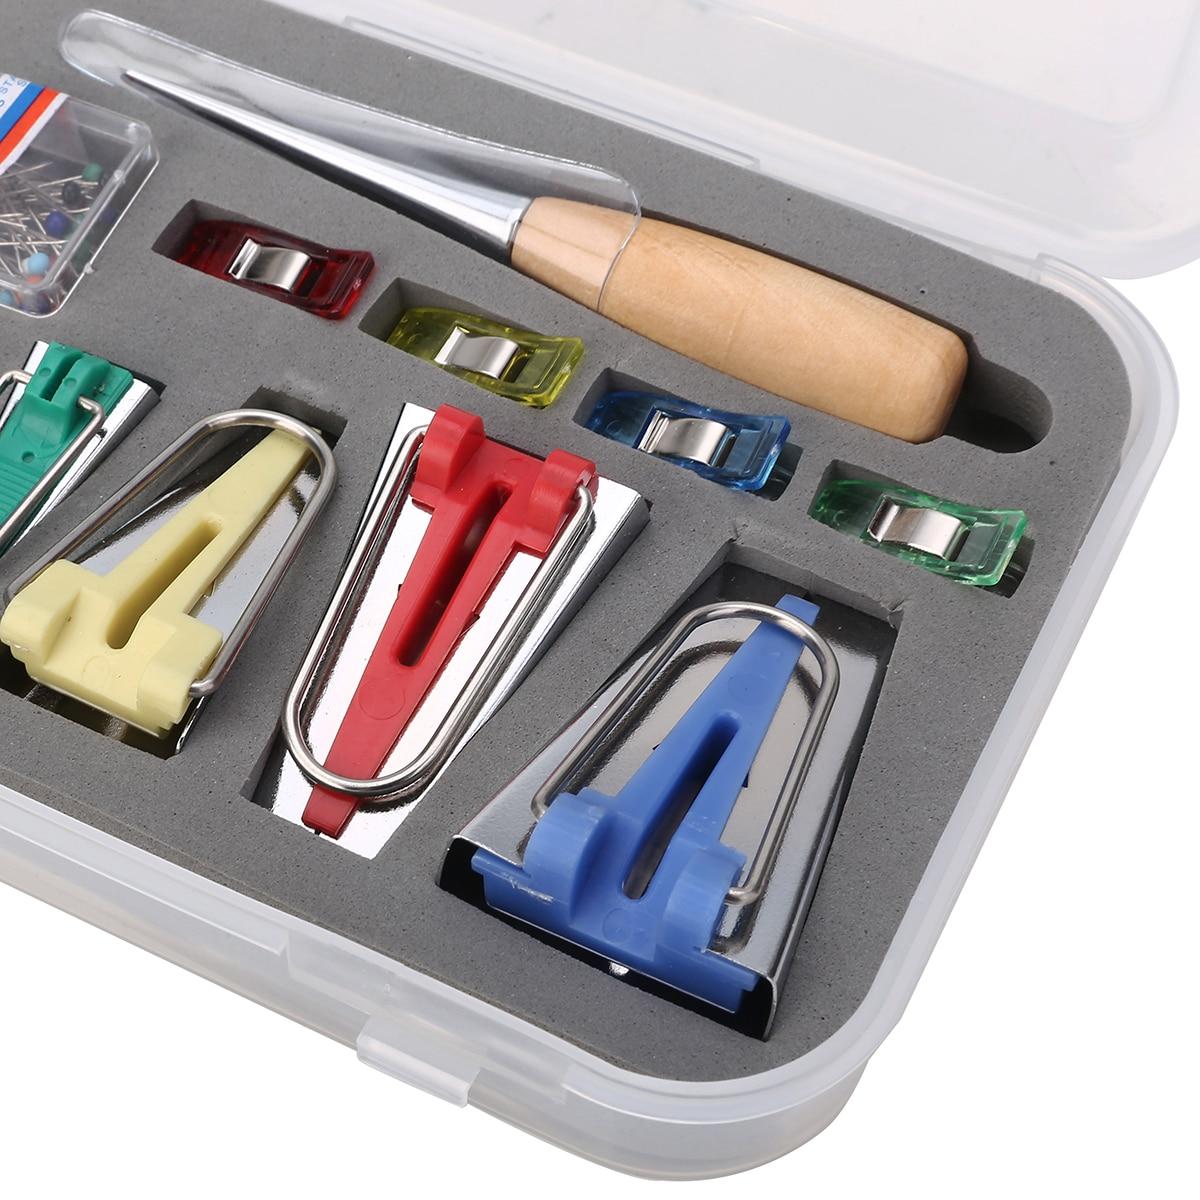 60pcs Fabric Bias Binding Tape Maker Kit Binder Foot Wooden Awl Clips Pins Household DIY Sewing Quilting Tool Set